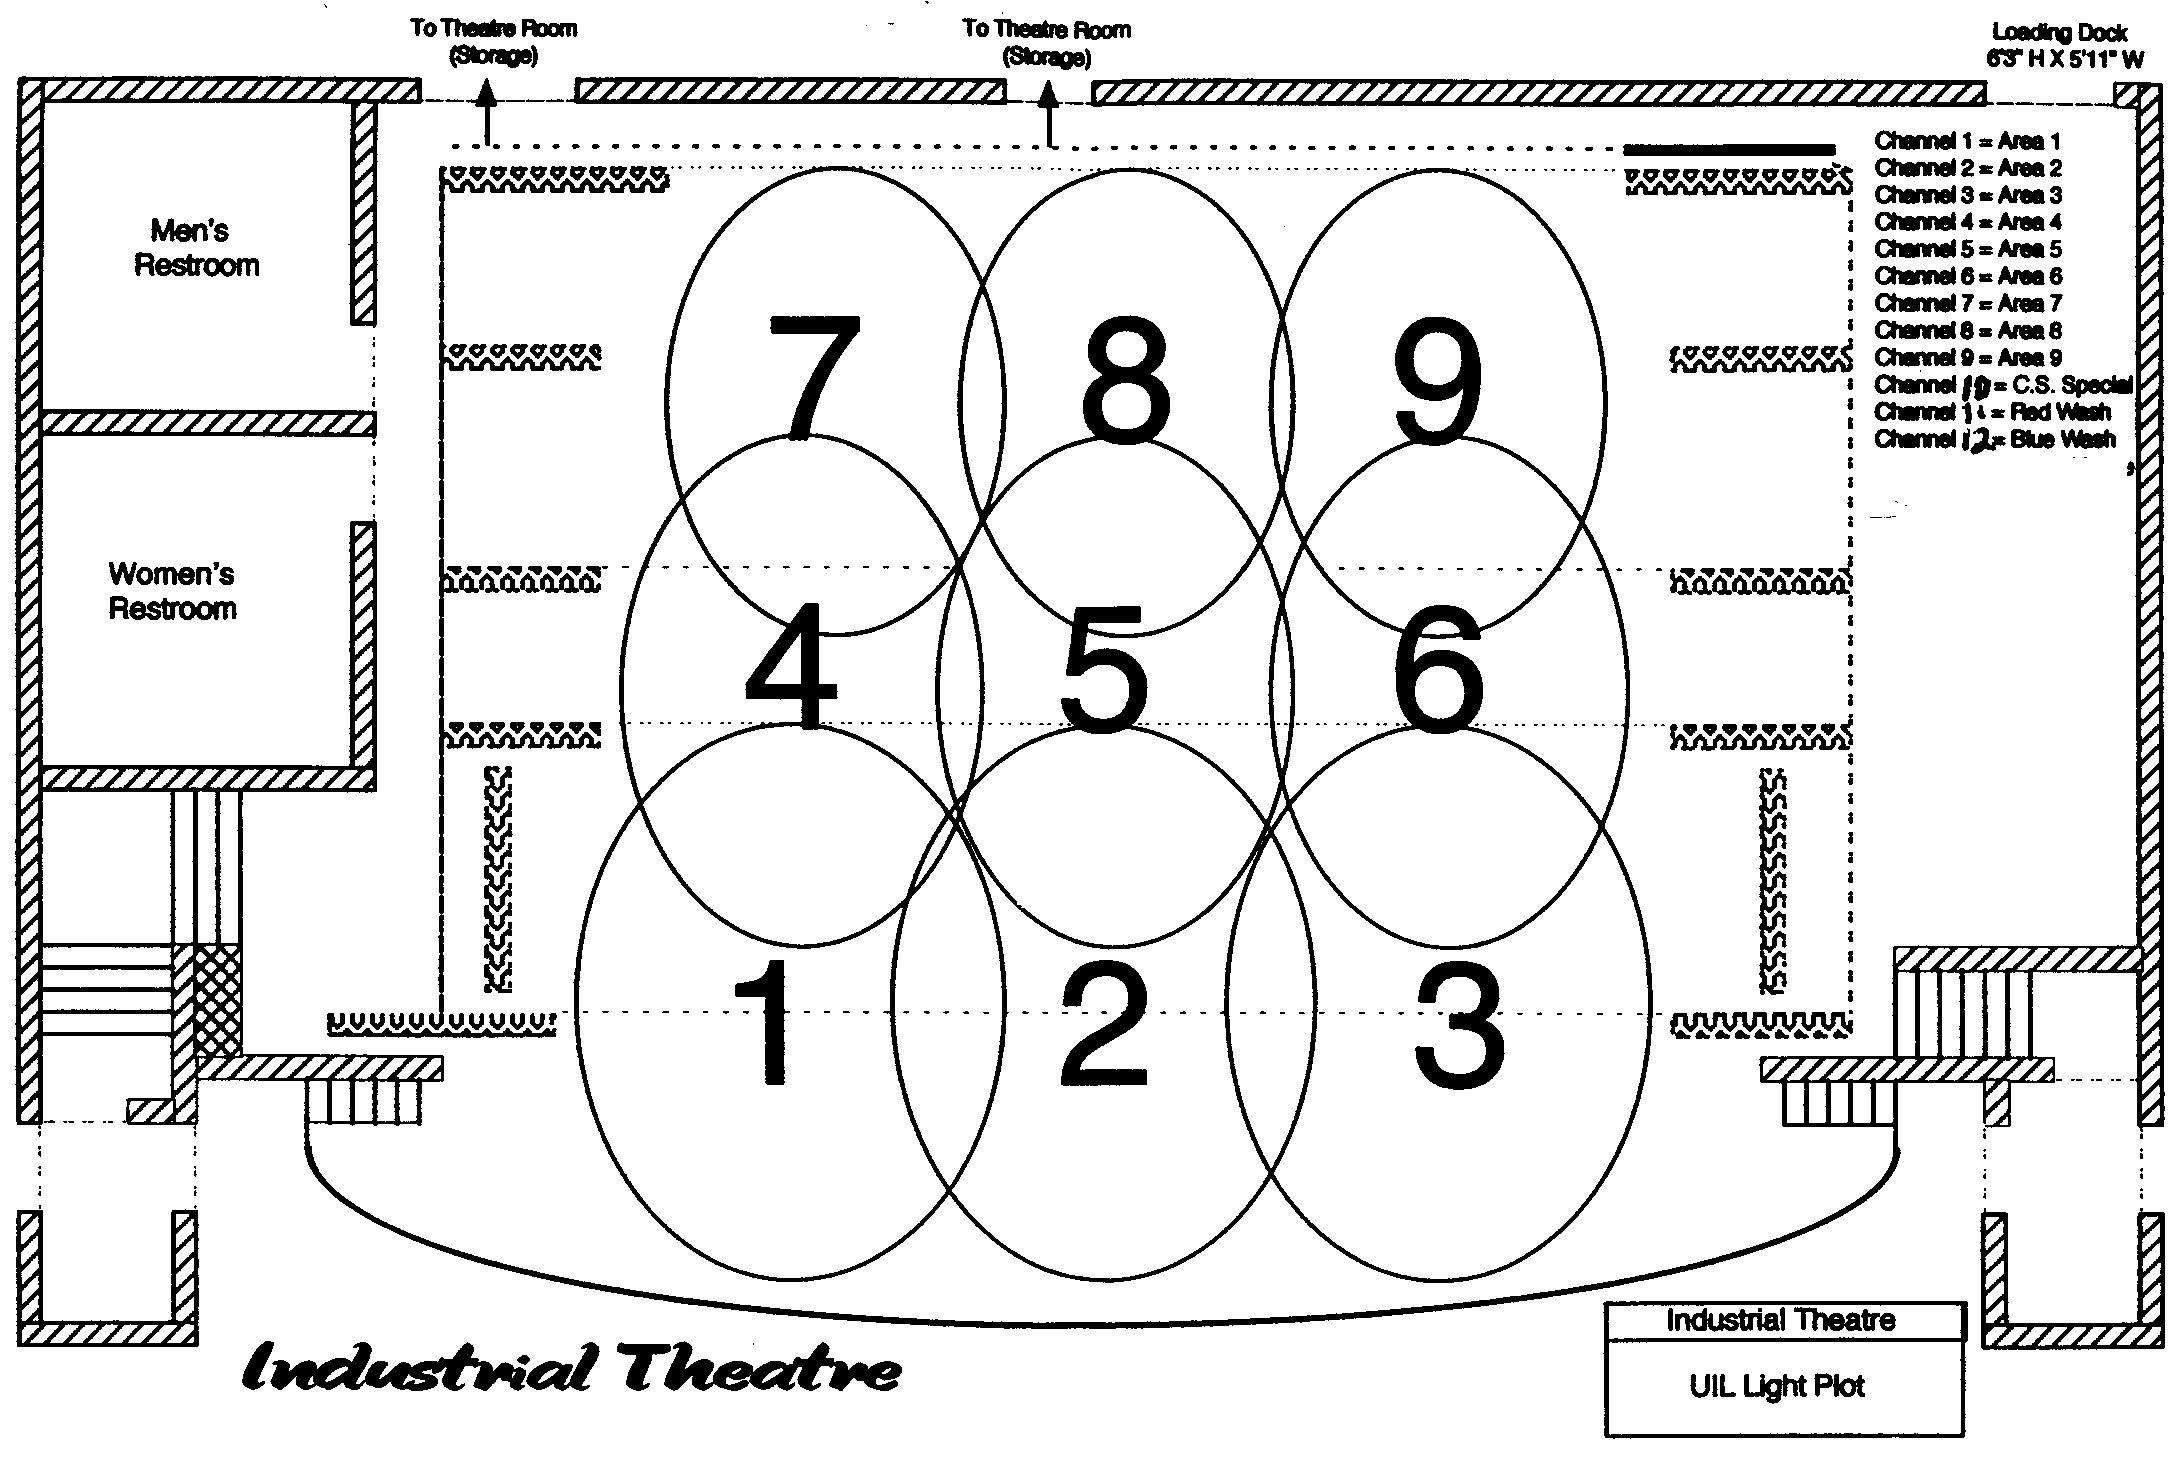 blank theatre stage diagram 91 240sx ignition wiring light plot 1 18 05 jpg 2 1841 470픽셀